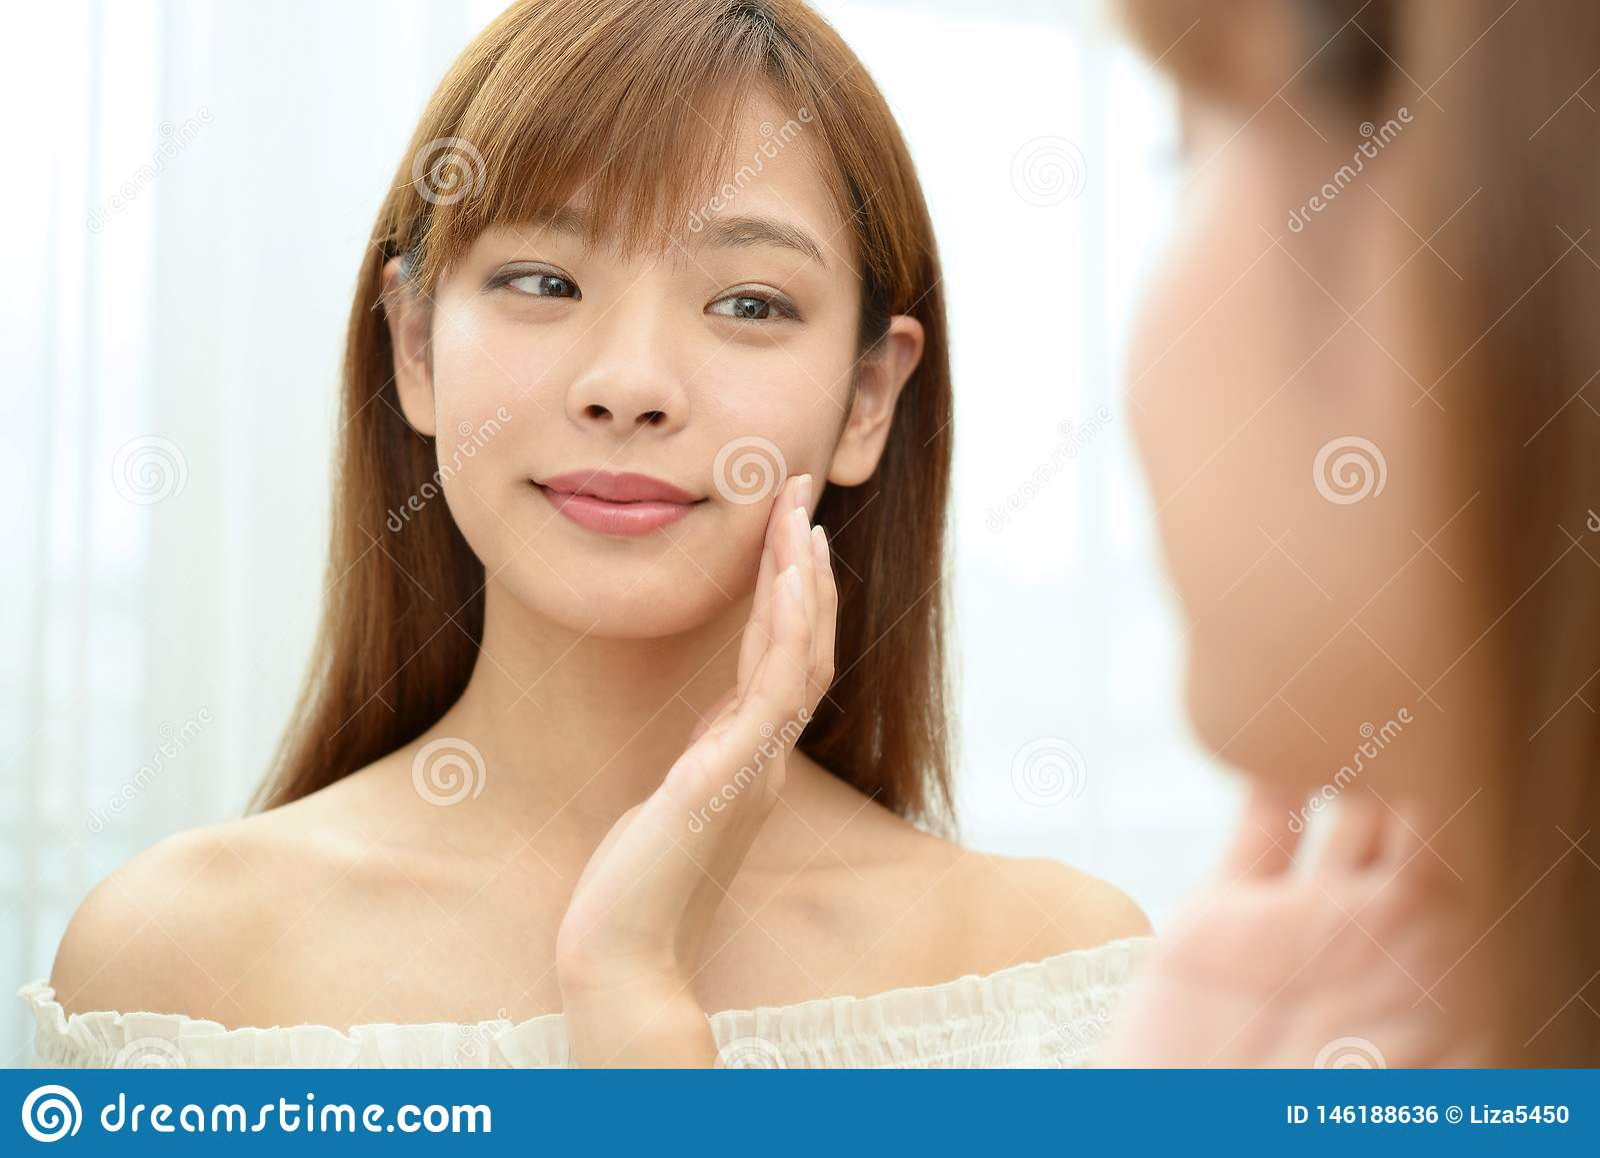 La femme qui prend soin de son visage